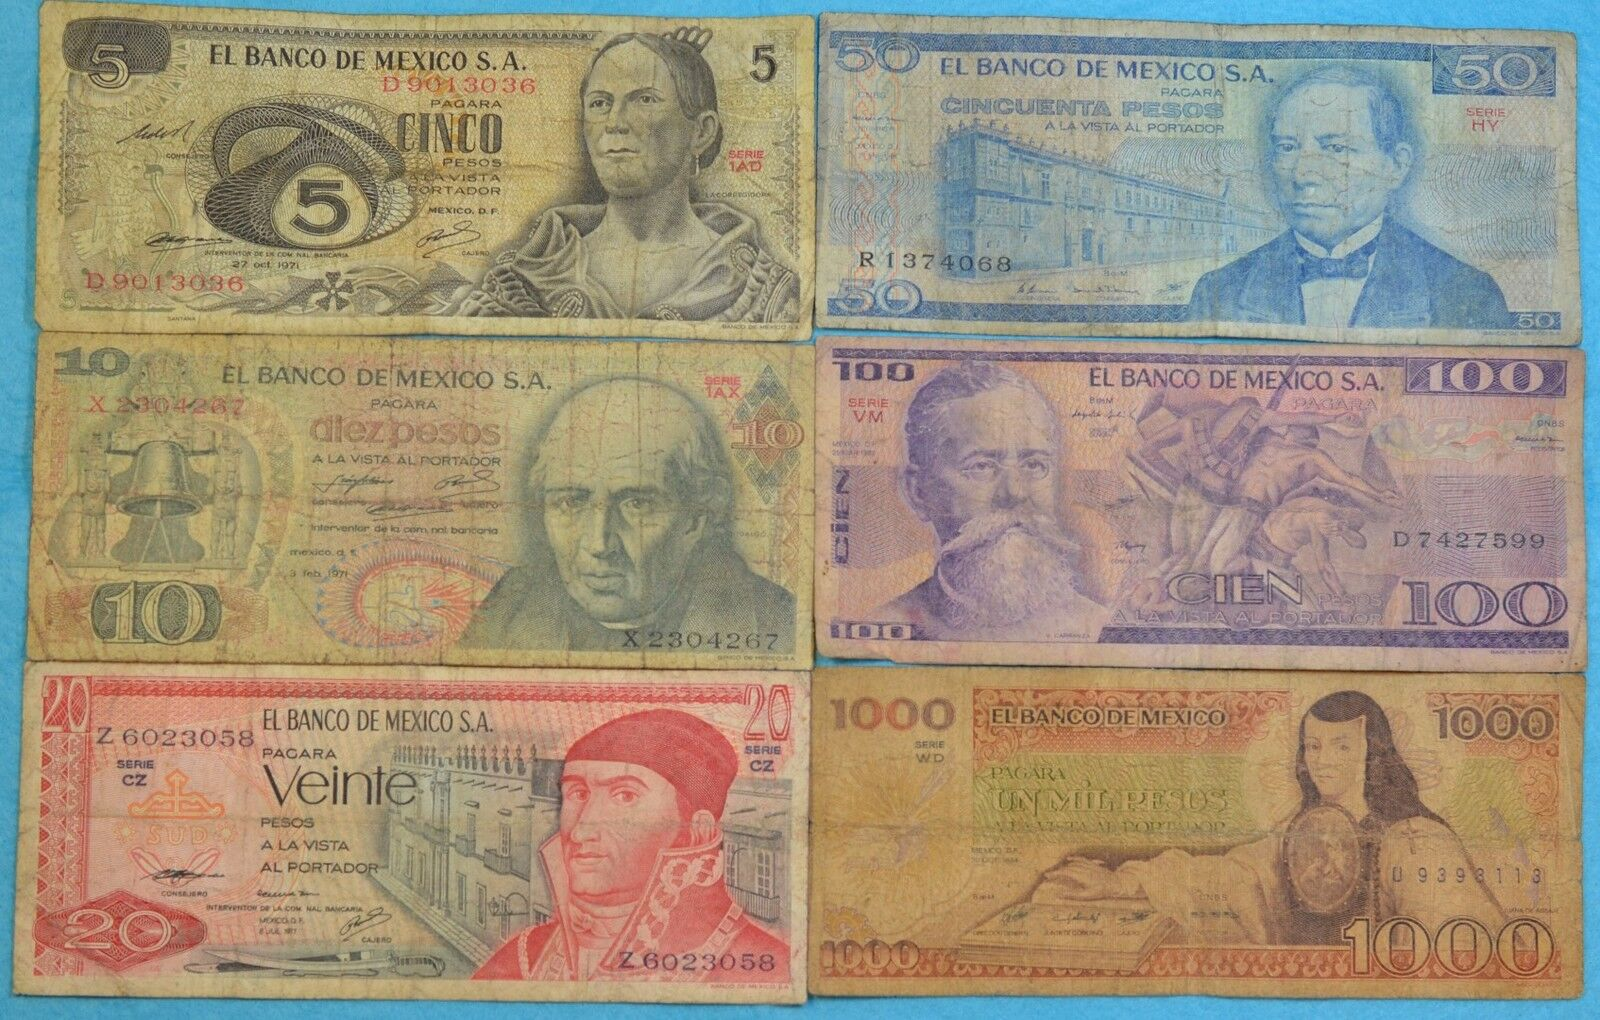 MEXICO SET 6 BANKNOTES LOT PLUS COINS 1970'S 1980'S 5 10 20 50 100 1000 pesos